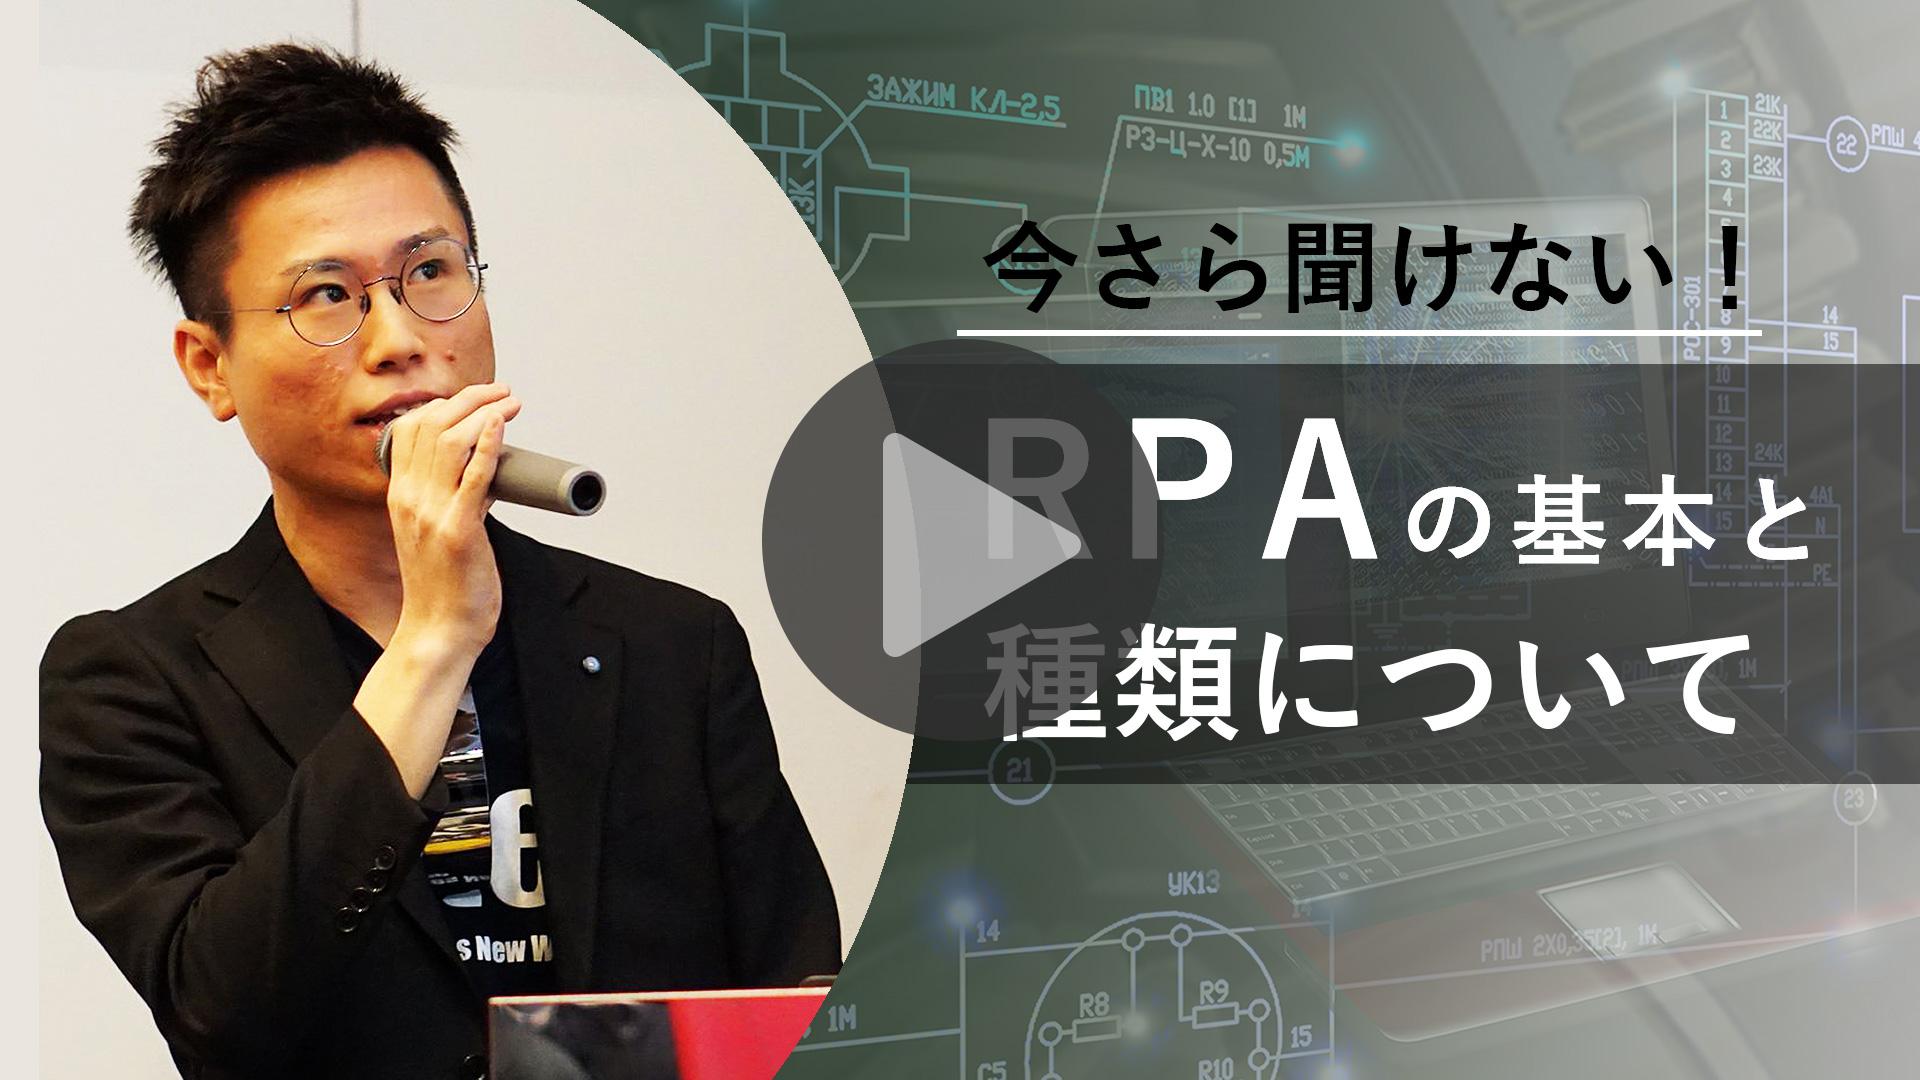 001 RPAの【基本】